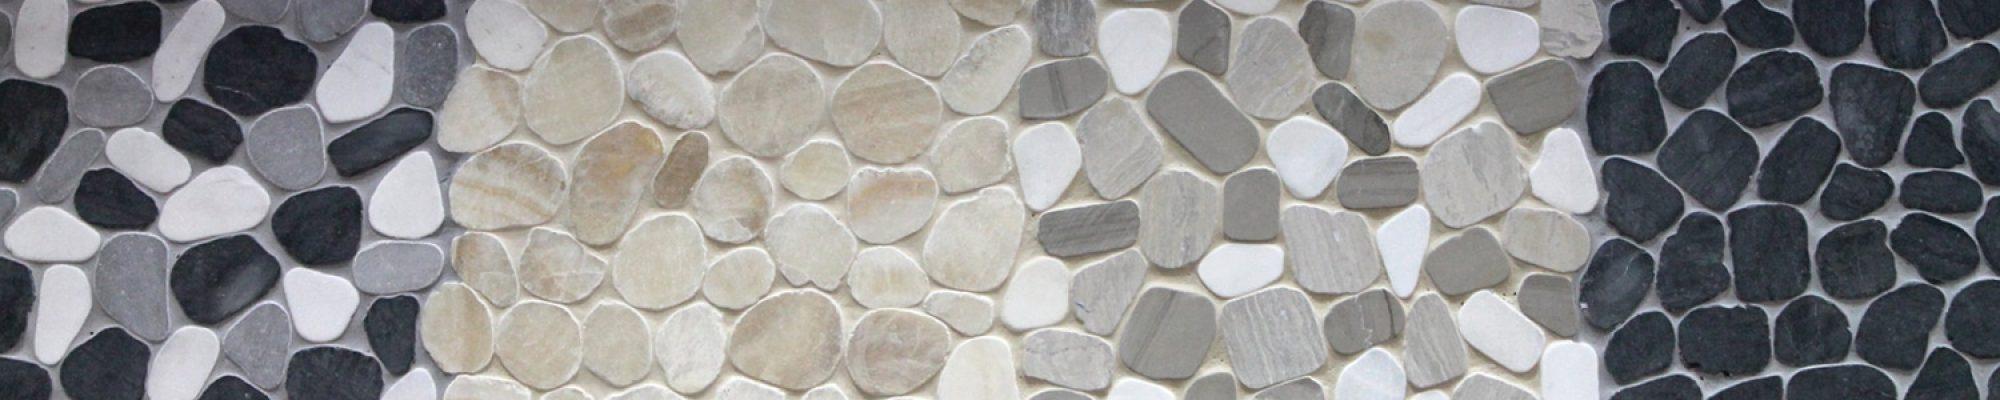 stone-mosaic-floor